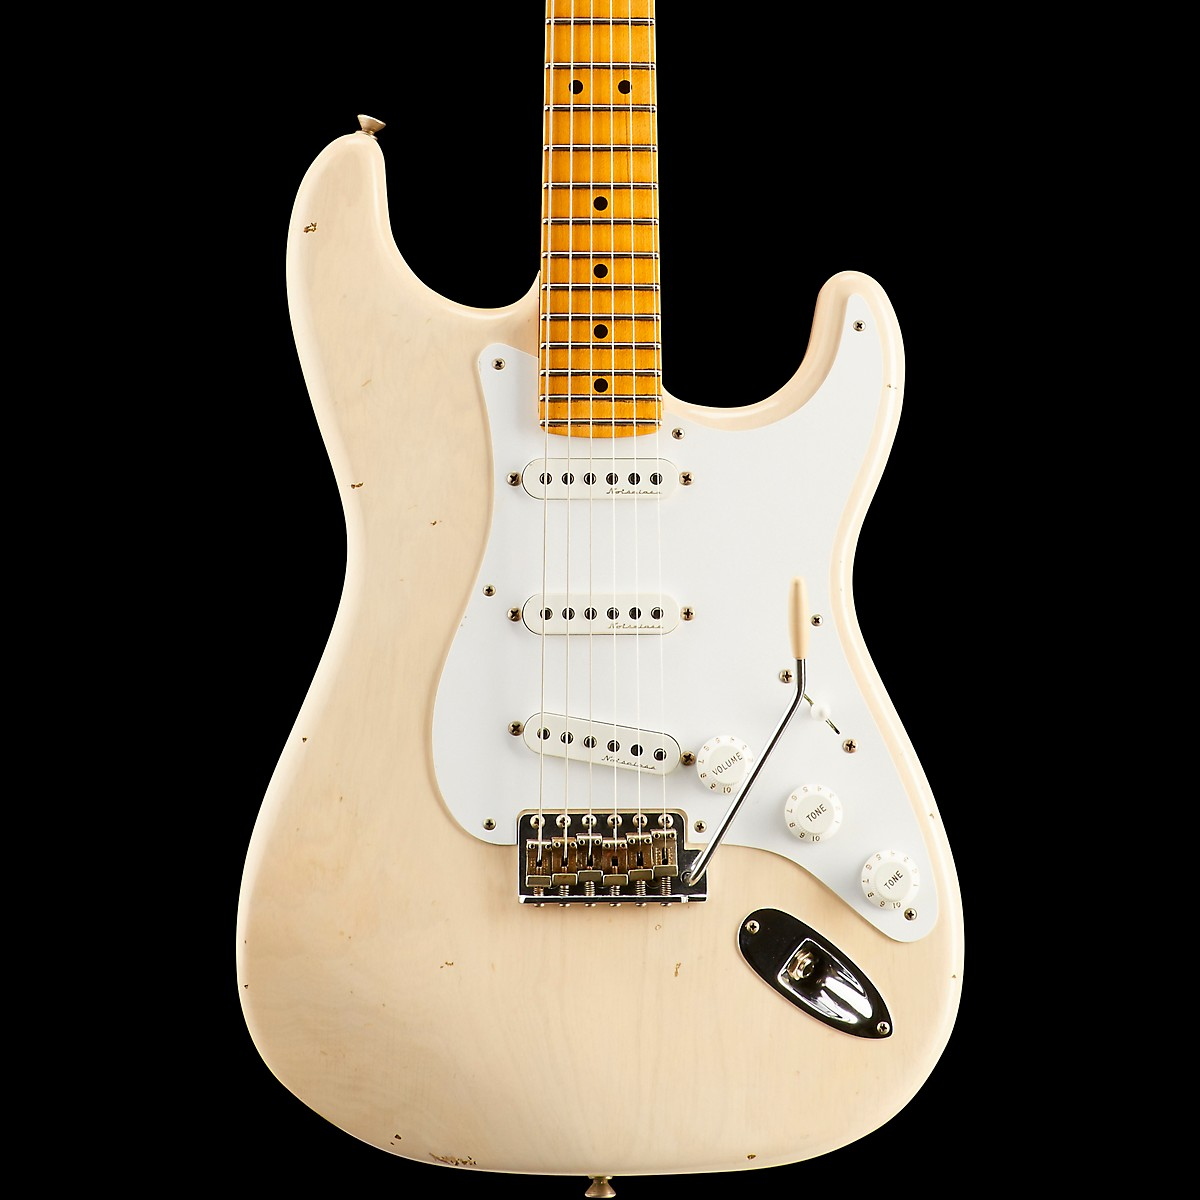 Fender Custom Shop Eric Clapton Journeyman Relic Signature Stratocaster with Maple Fingerboard